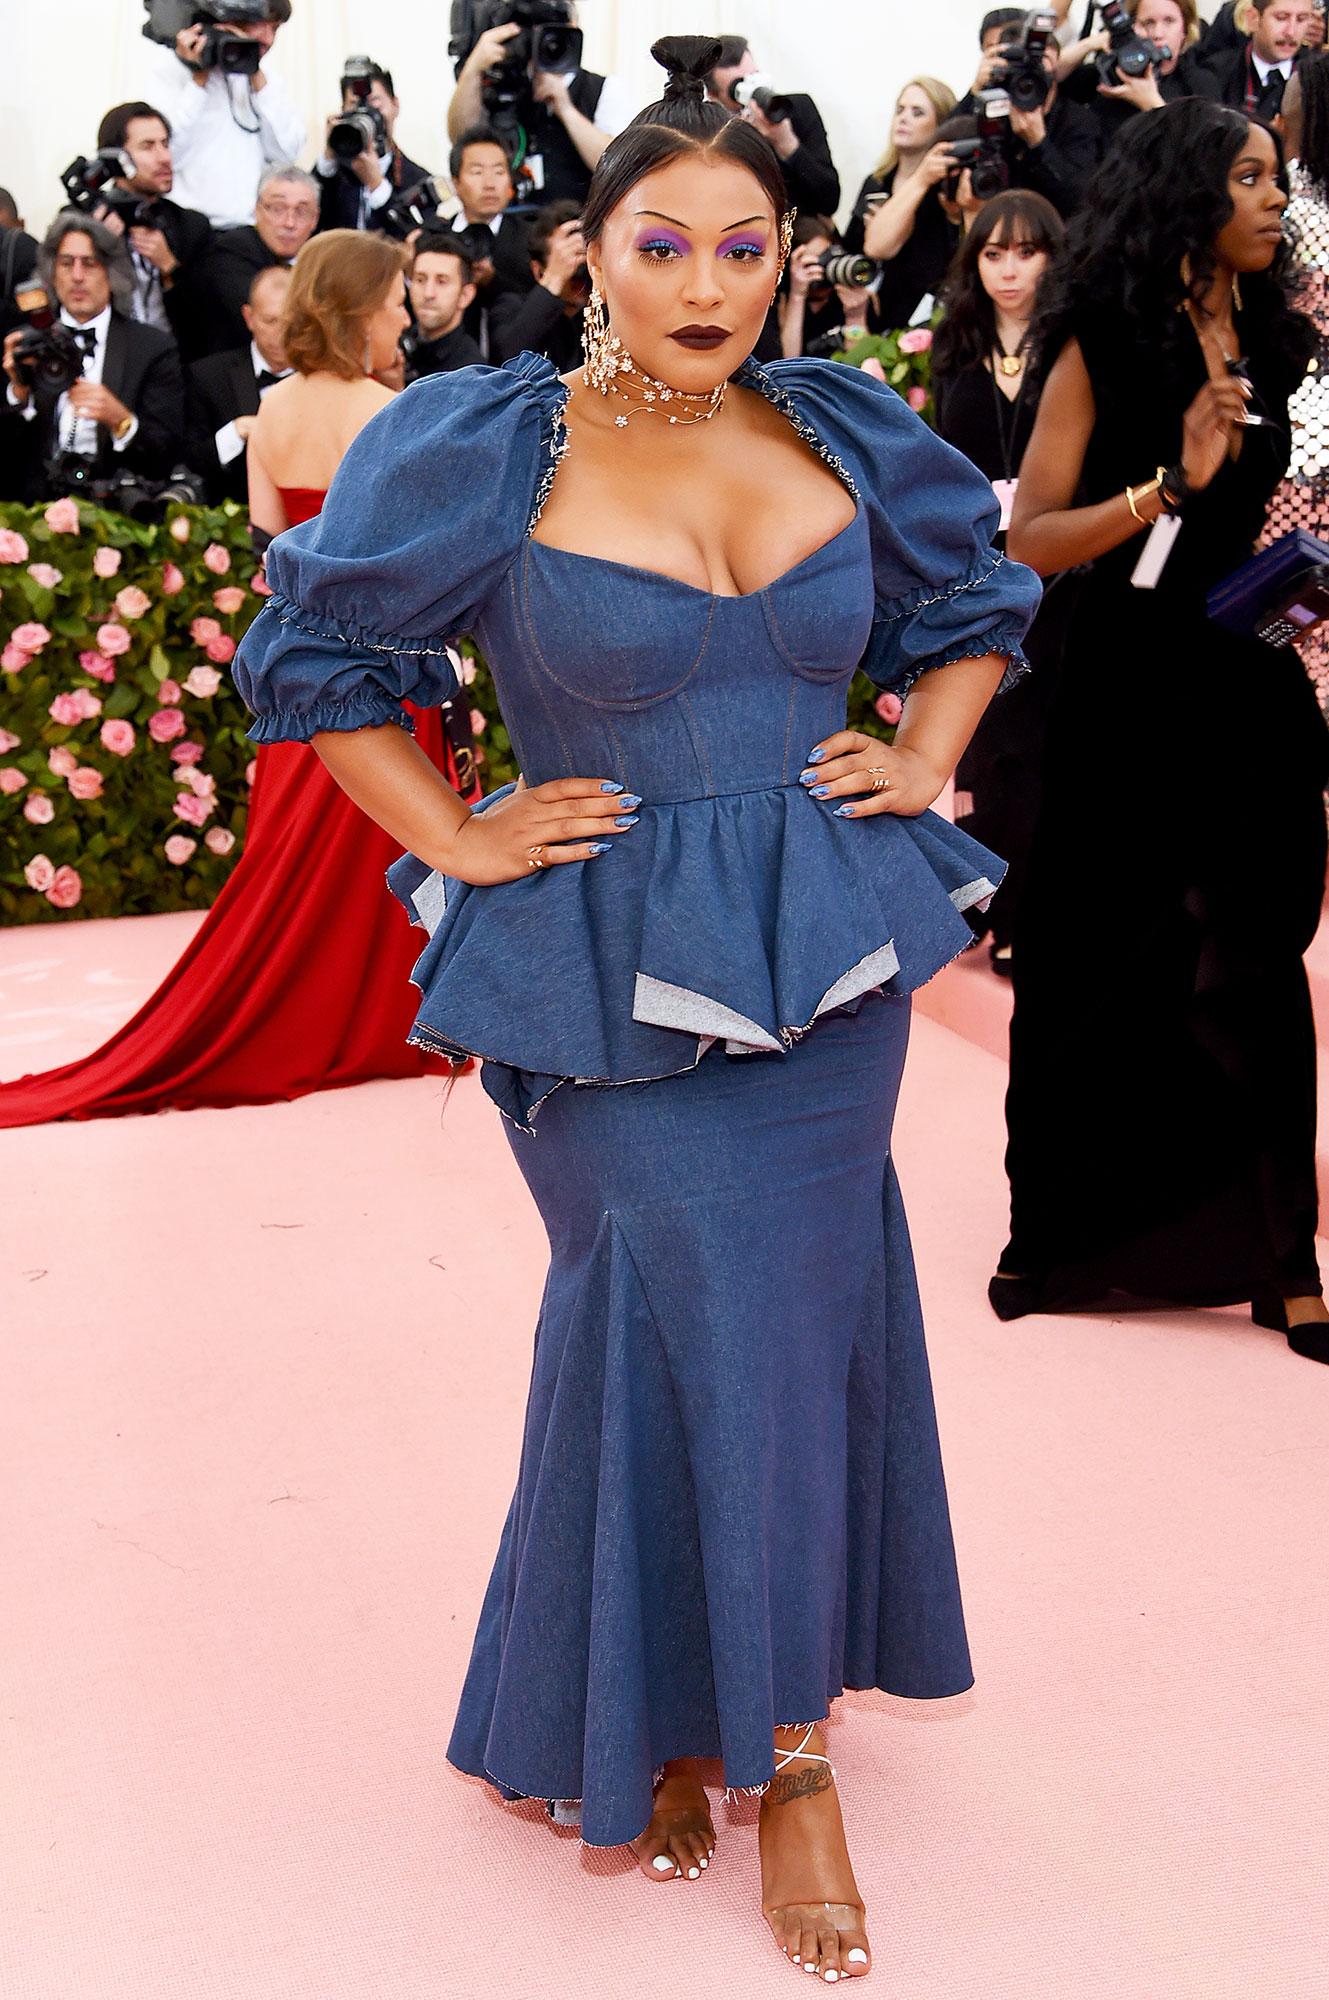 Paloma Elsesser met gala 2019 - Wearing a blue peplum tea-length frock.